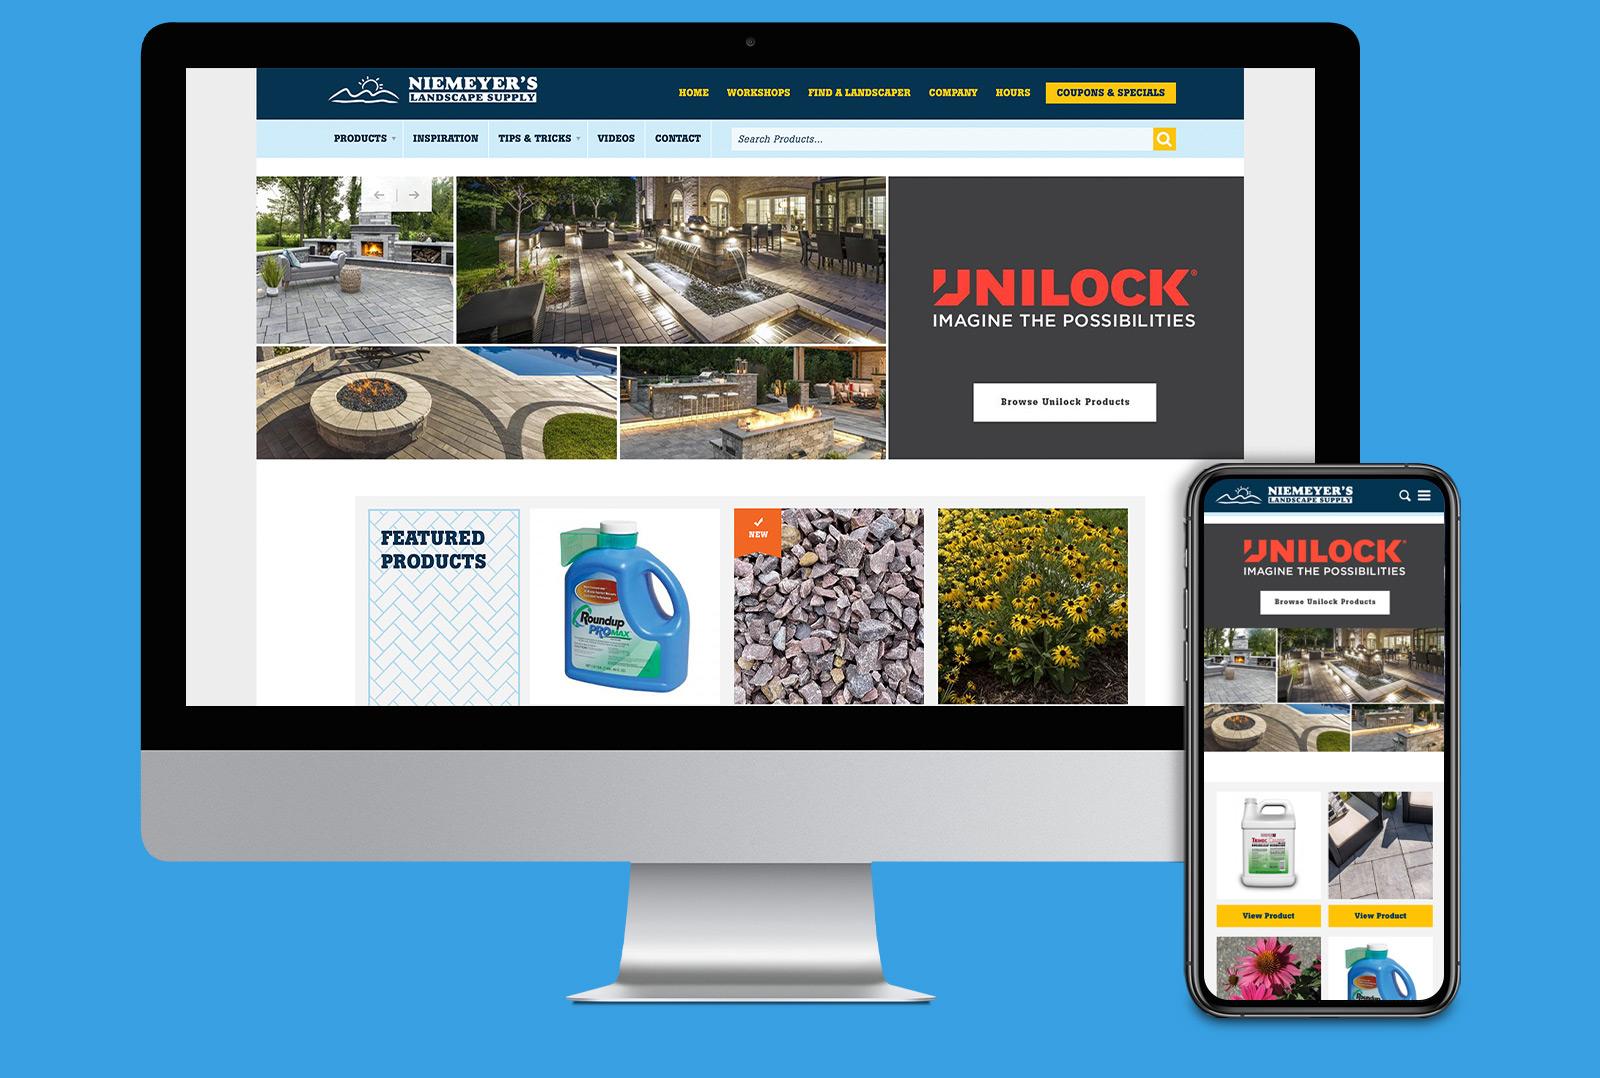 Niemeyer's website landing page on desktop and mobile